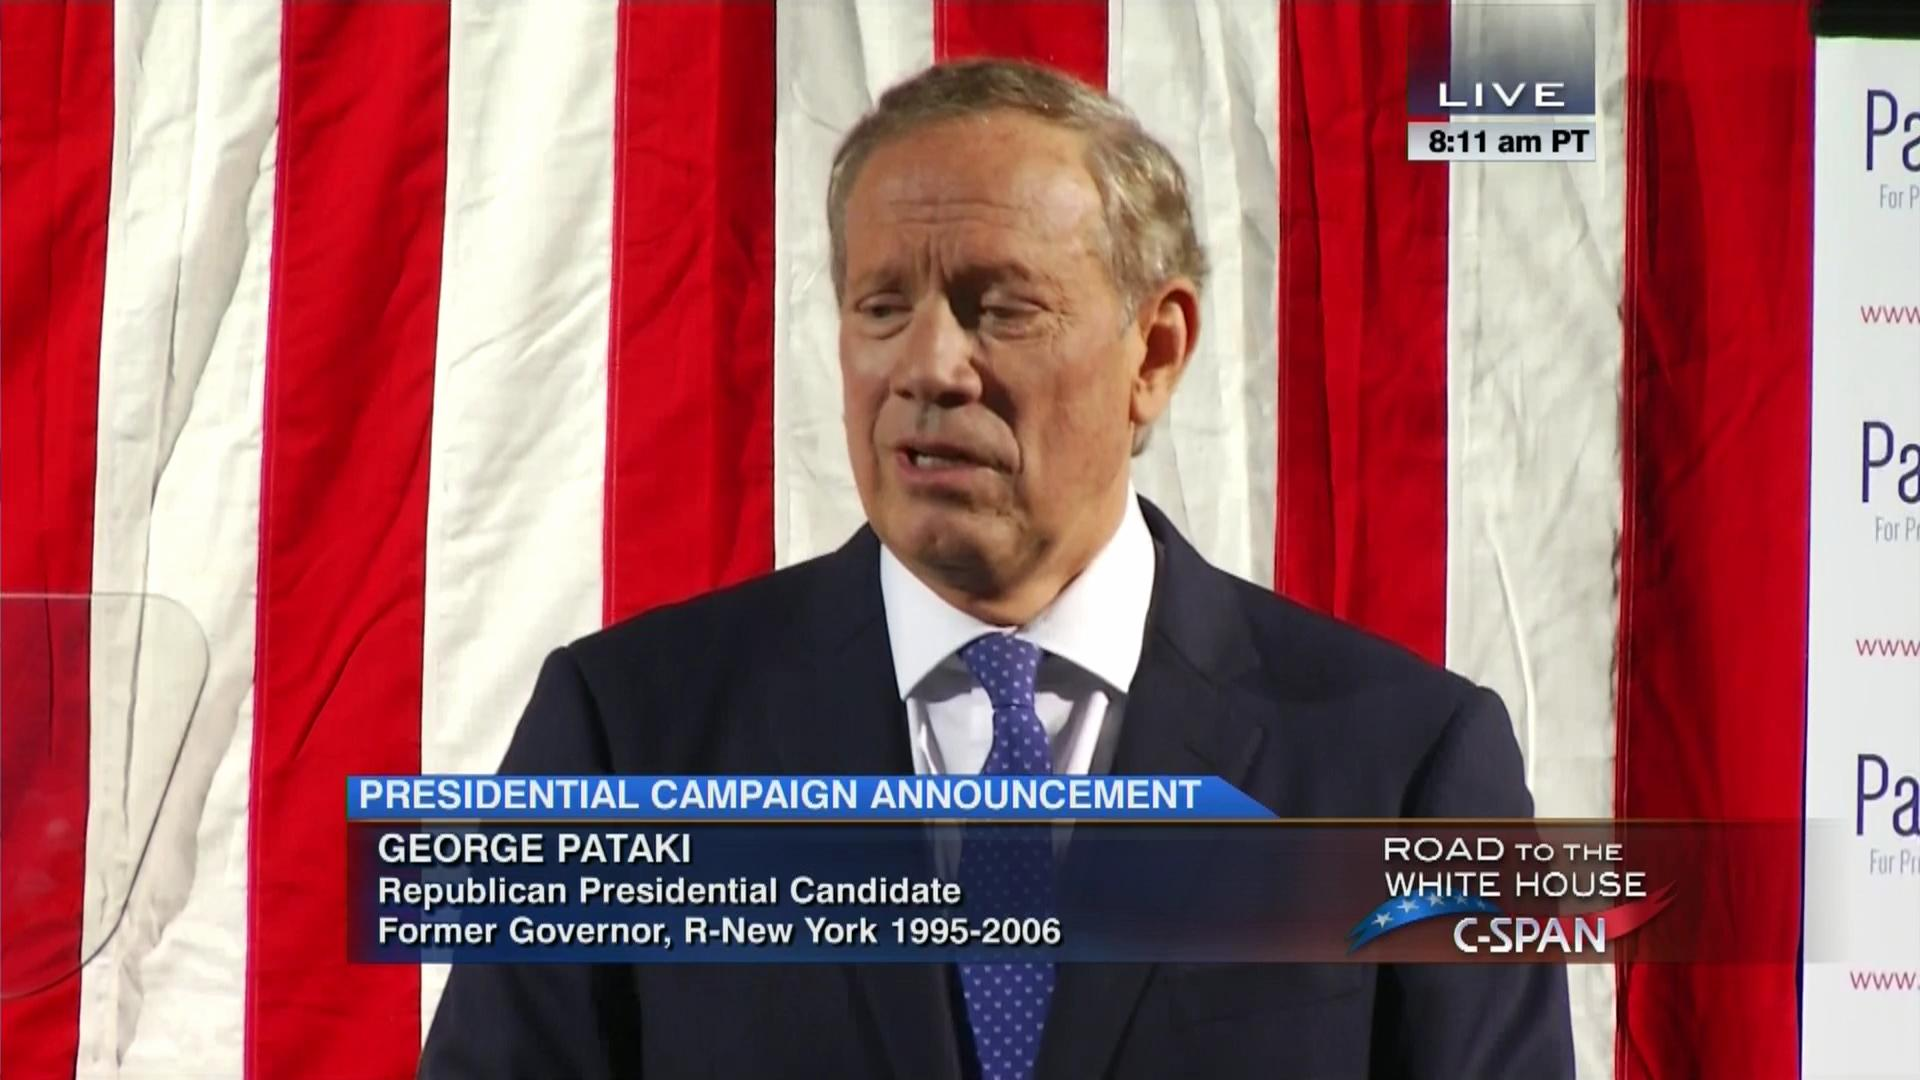 George Pataki 2015